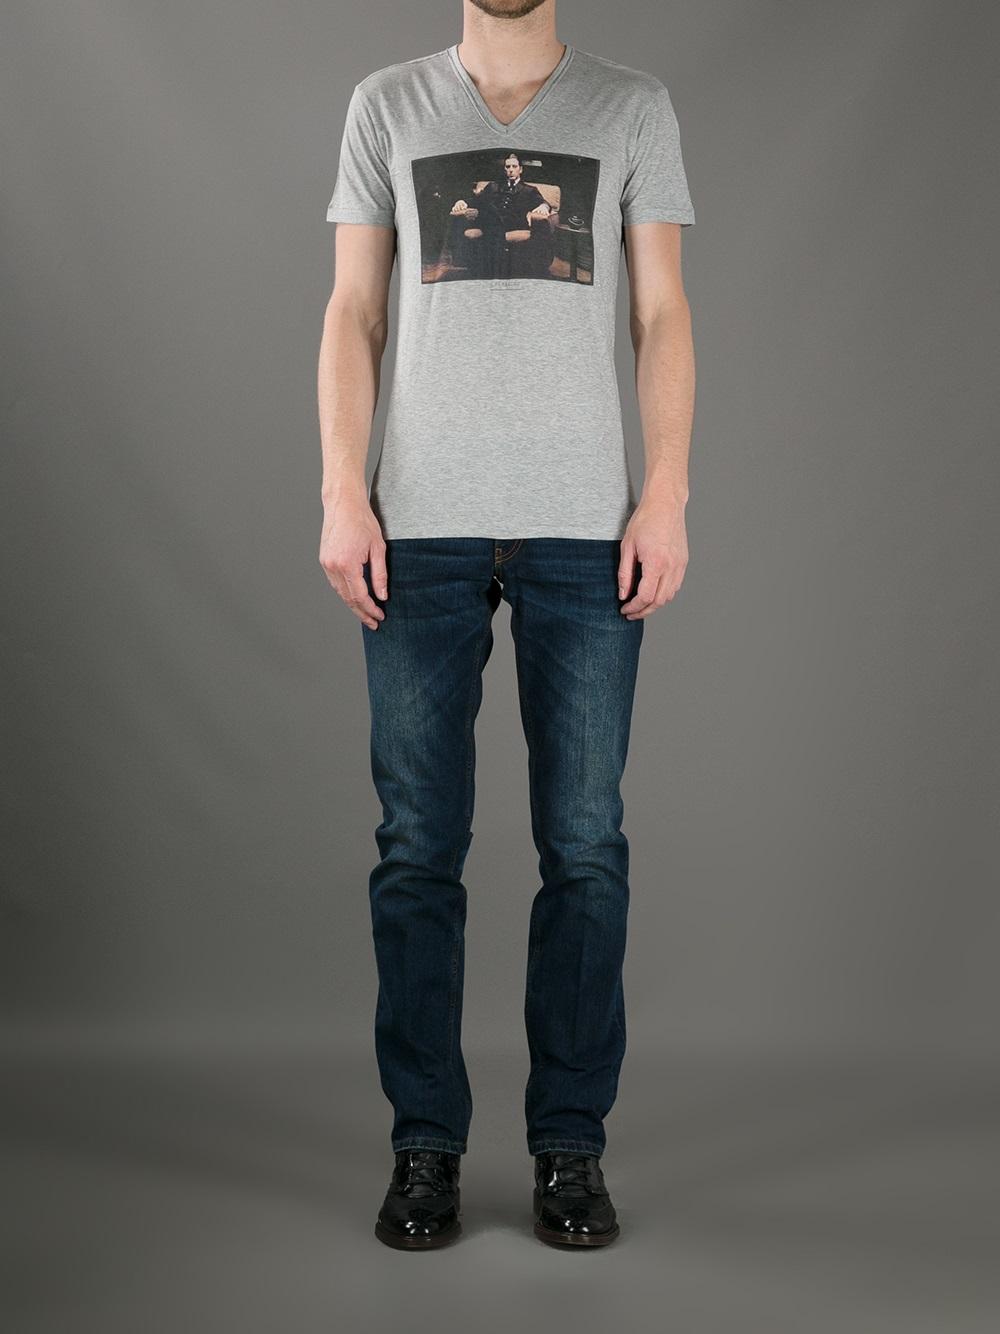 Lyst dolce gabbana al pacino printed tshirt in gray for T shirt printing mobile al